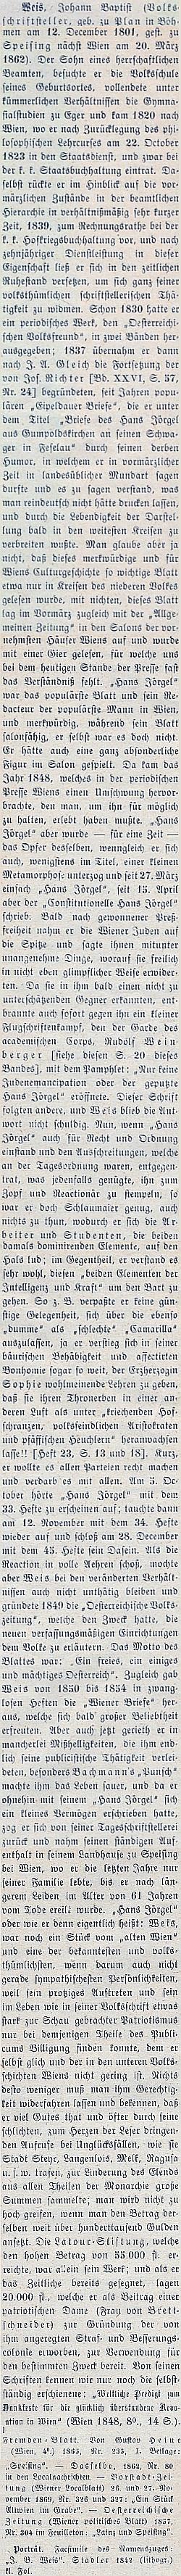 Jeho obsáhlý životopis na stránkách Wurzbachova lexikonu významných rakouských osobností